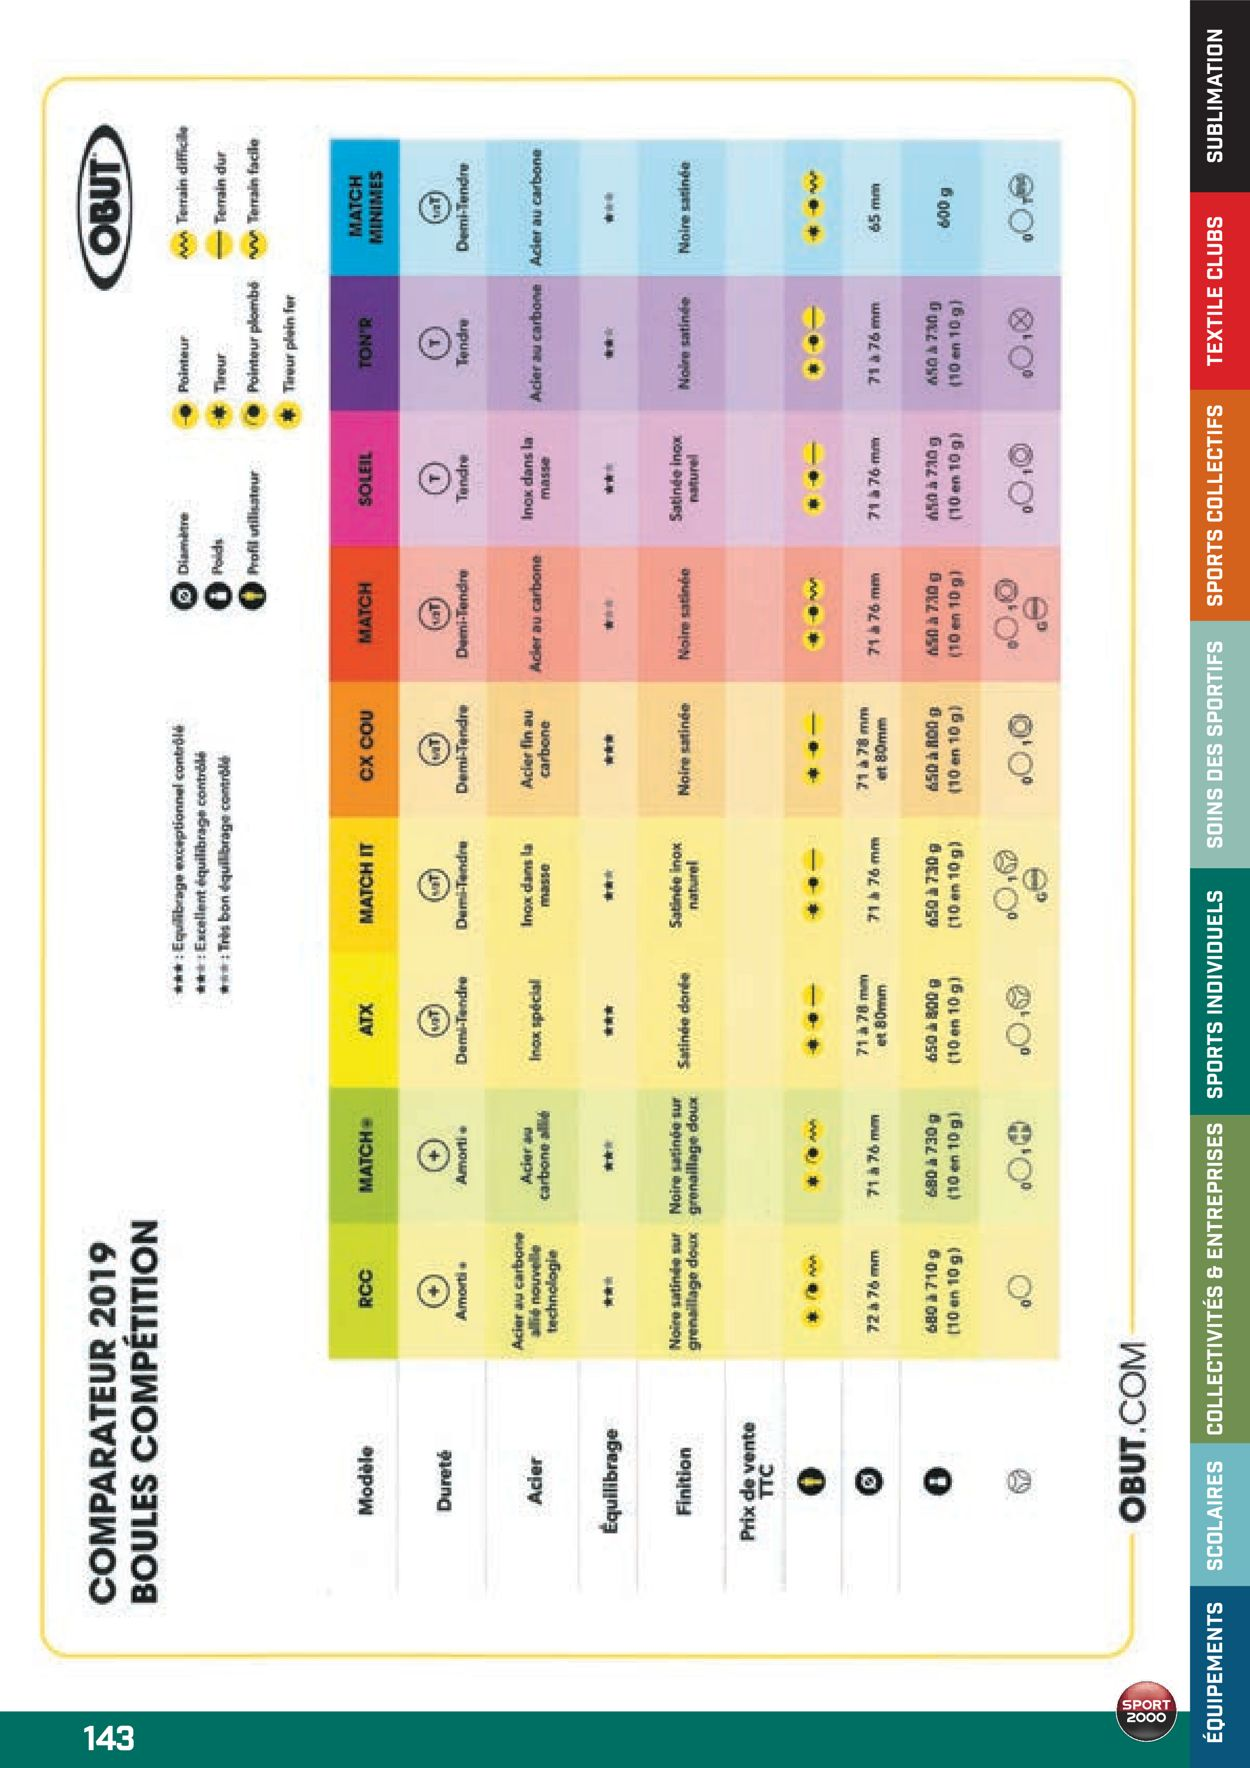 Sport 2000 Catalogue - 01.10-31.07.2020 (Page 143)